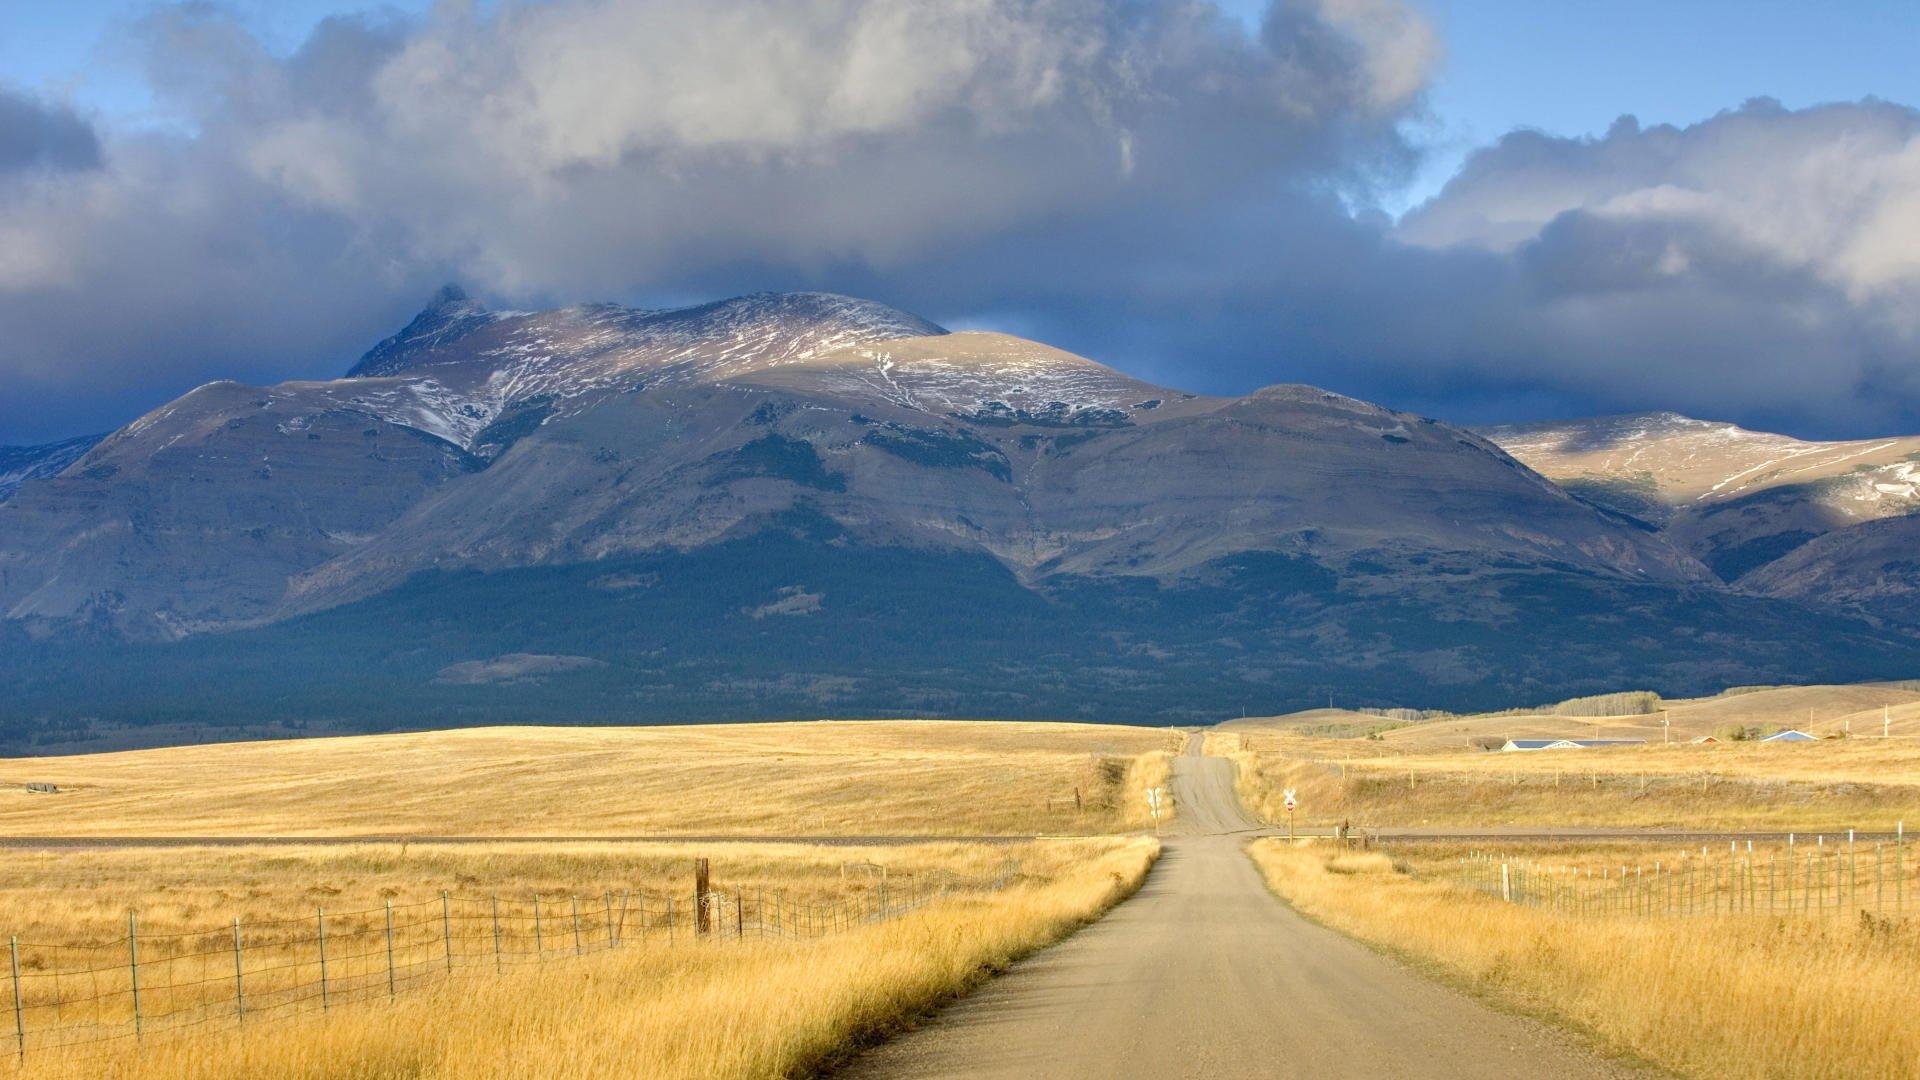 Montana Wallpaper HD